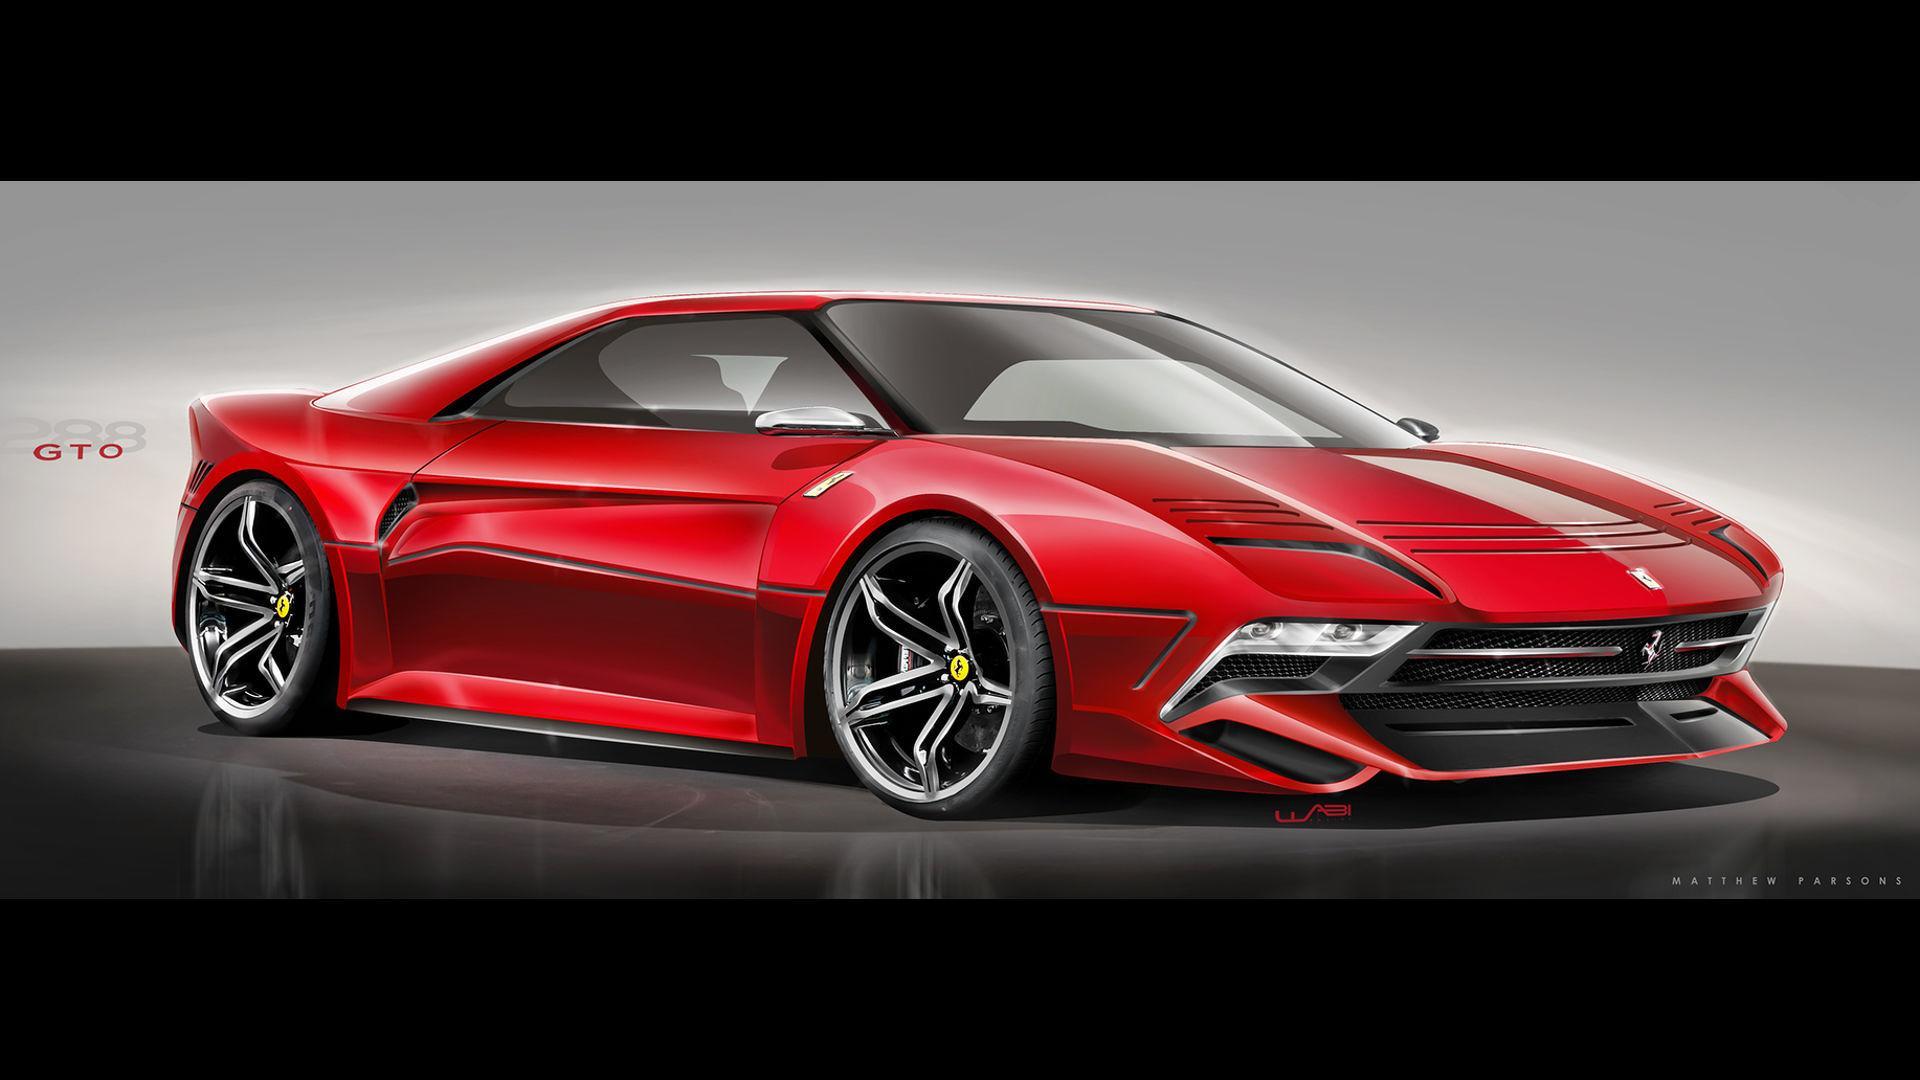 Ferrari  Gto Kit Car For Sale